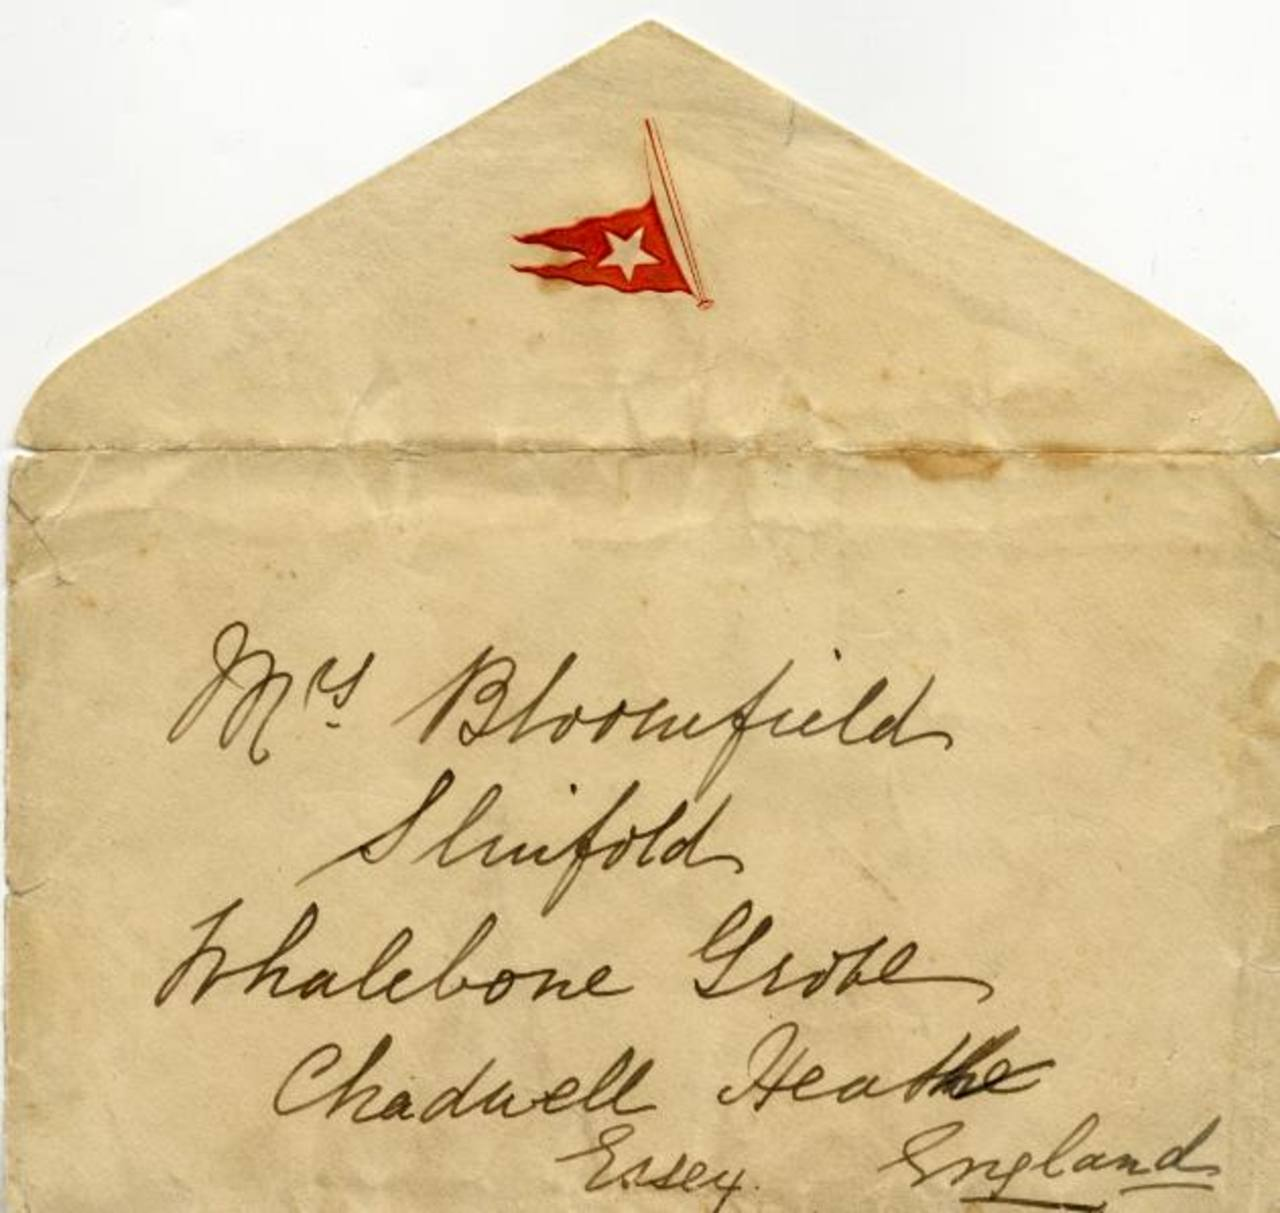 Una carta del Titanic vendida en un precio récord de $200 mil